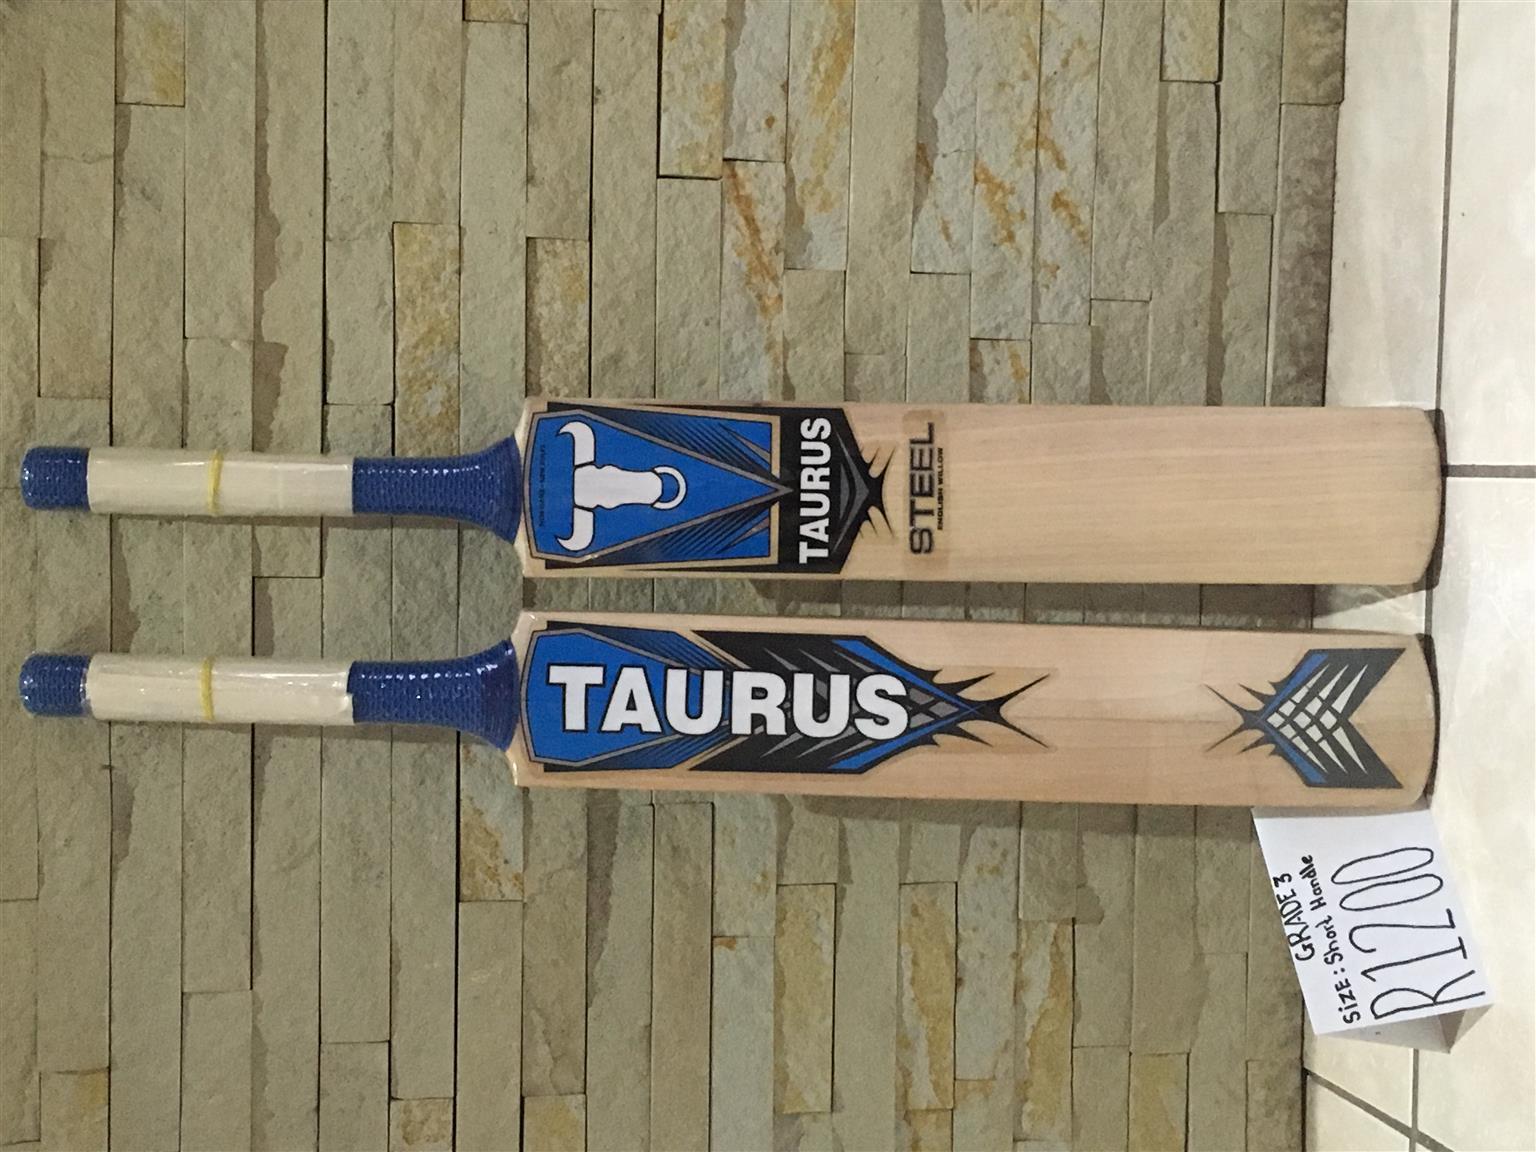 New Taurus Steel cricket bats